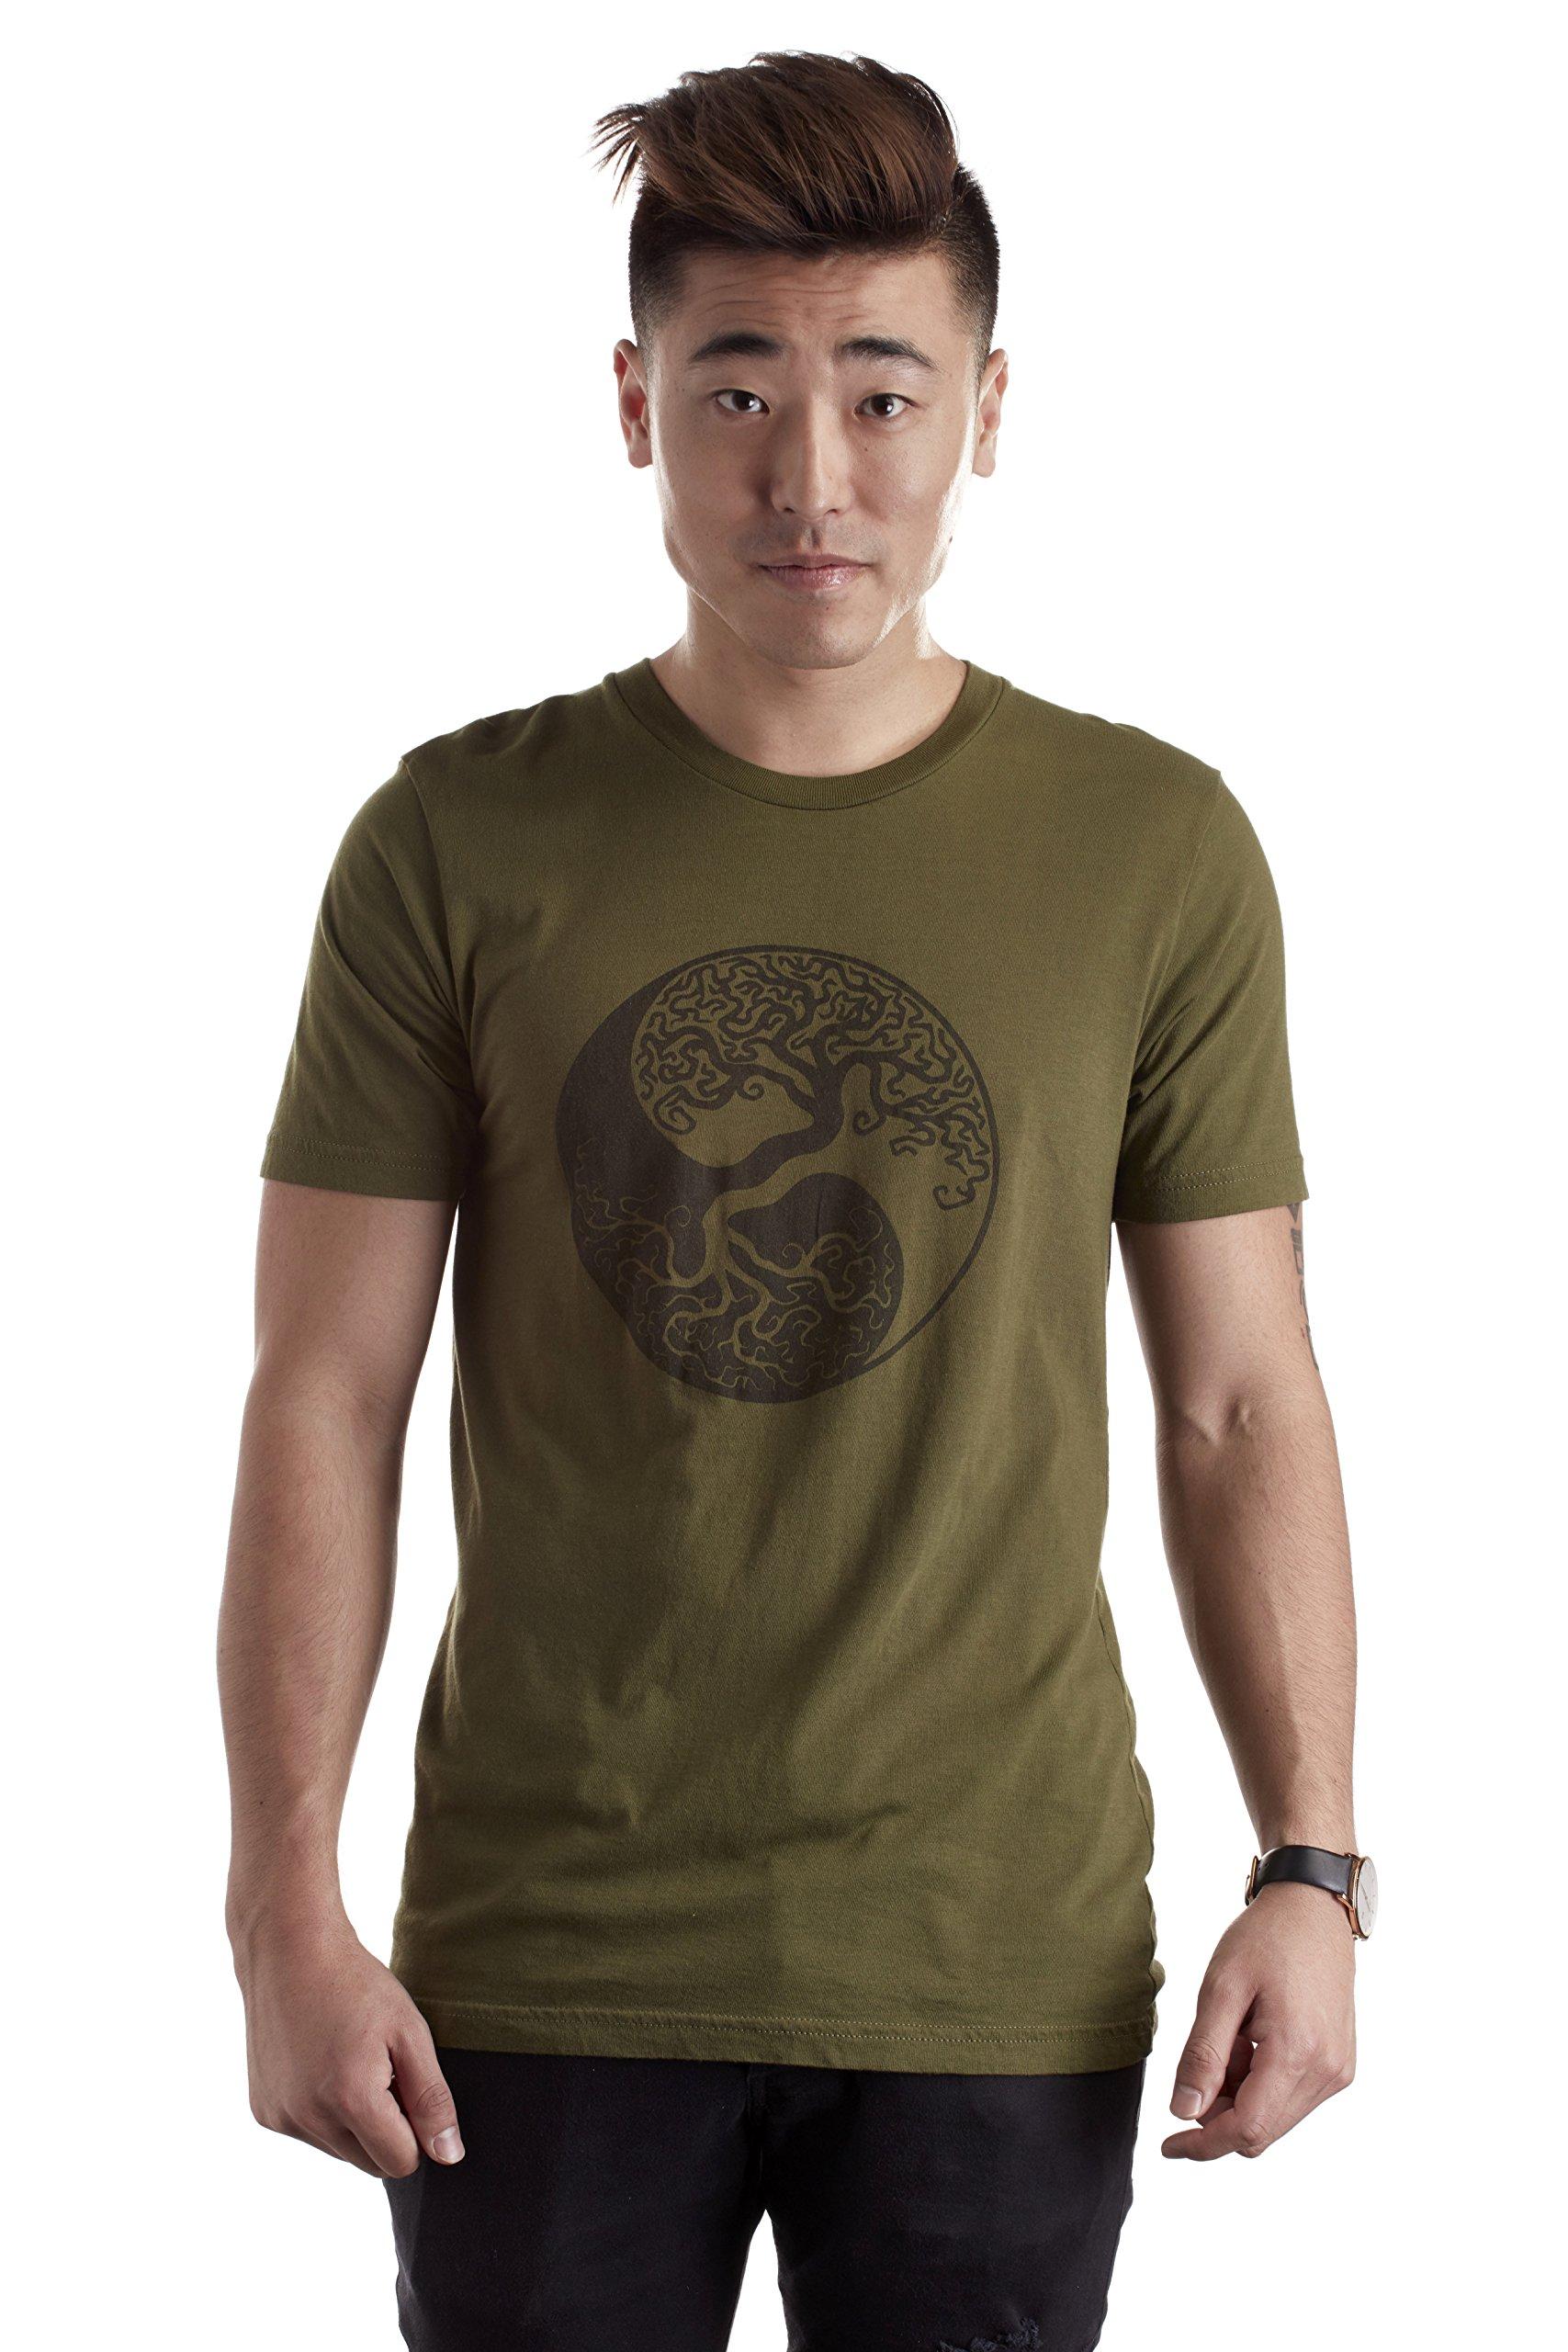 Unisex Hemp T-Shirt, Made from Hemp, Yin Yang Tree of Life Design Top, 100% Organic Sustainable Tee